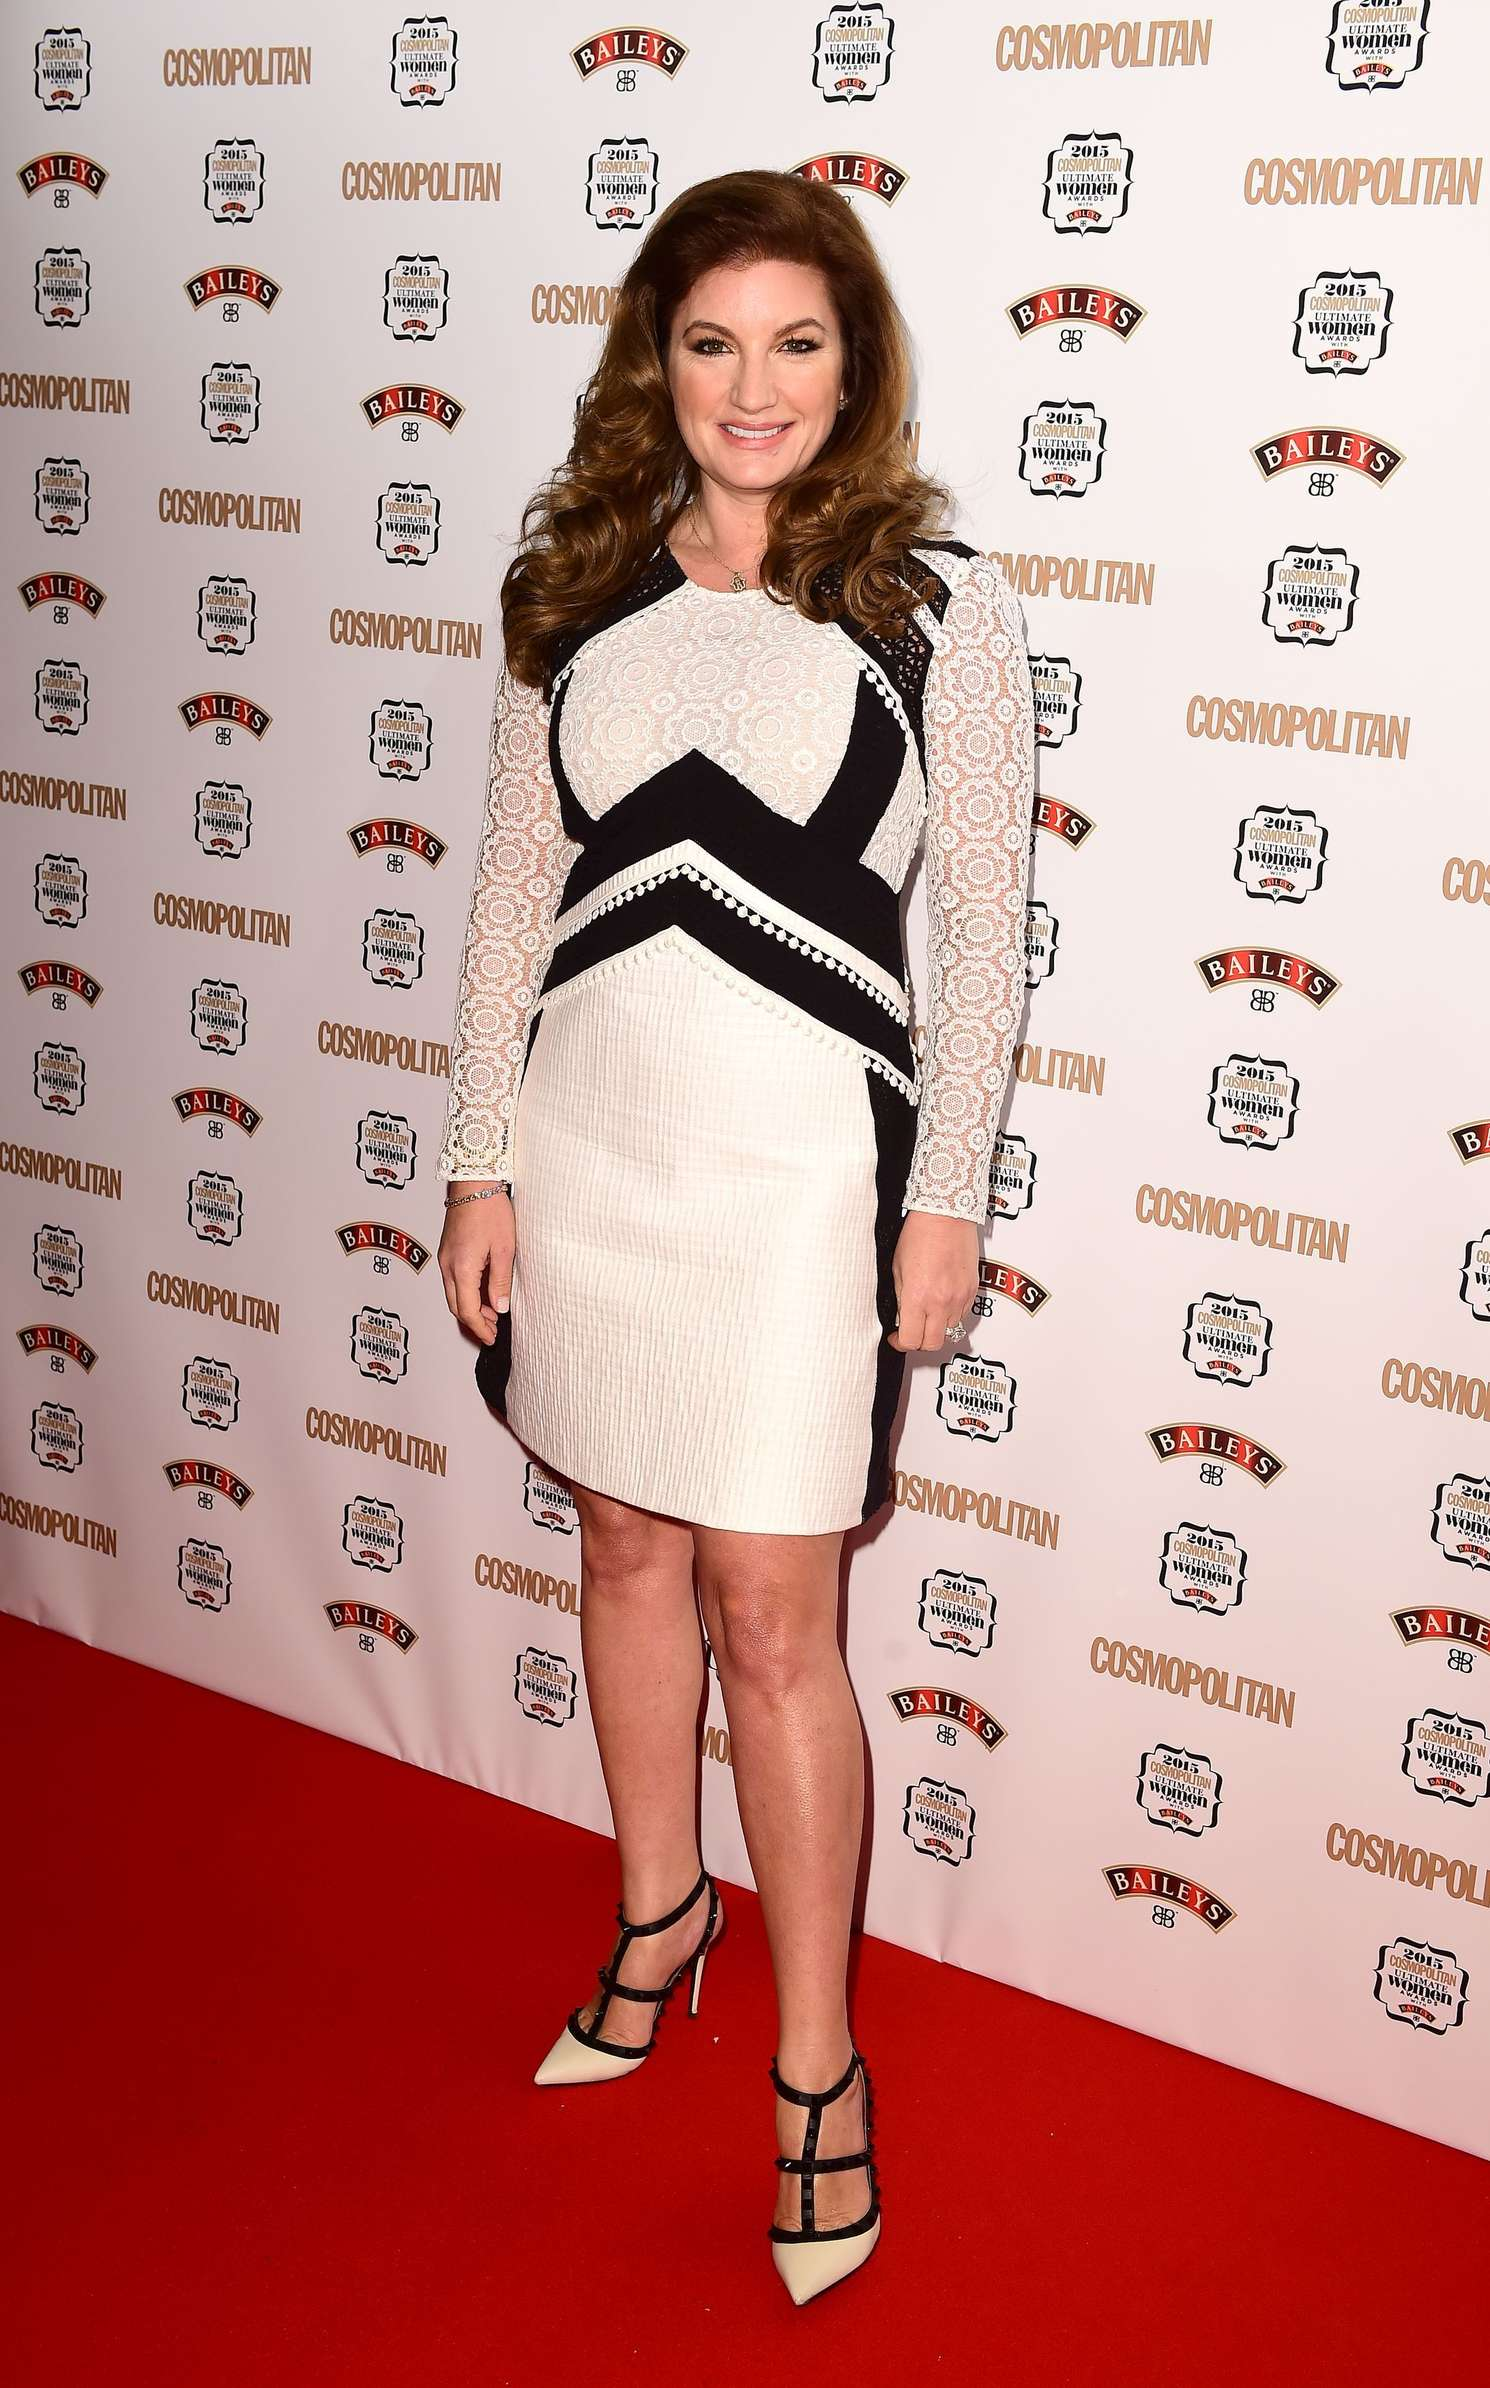 Alesha dixon pictures cosmopolitan ultimate women of the year awards - Karren Brady Cosmopolitan Ultimate Women Of The Year Awards 2015 In London